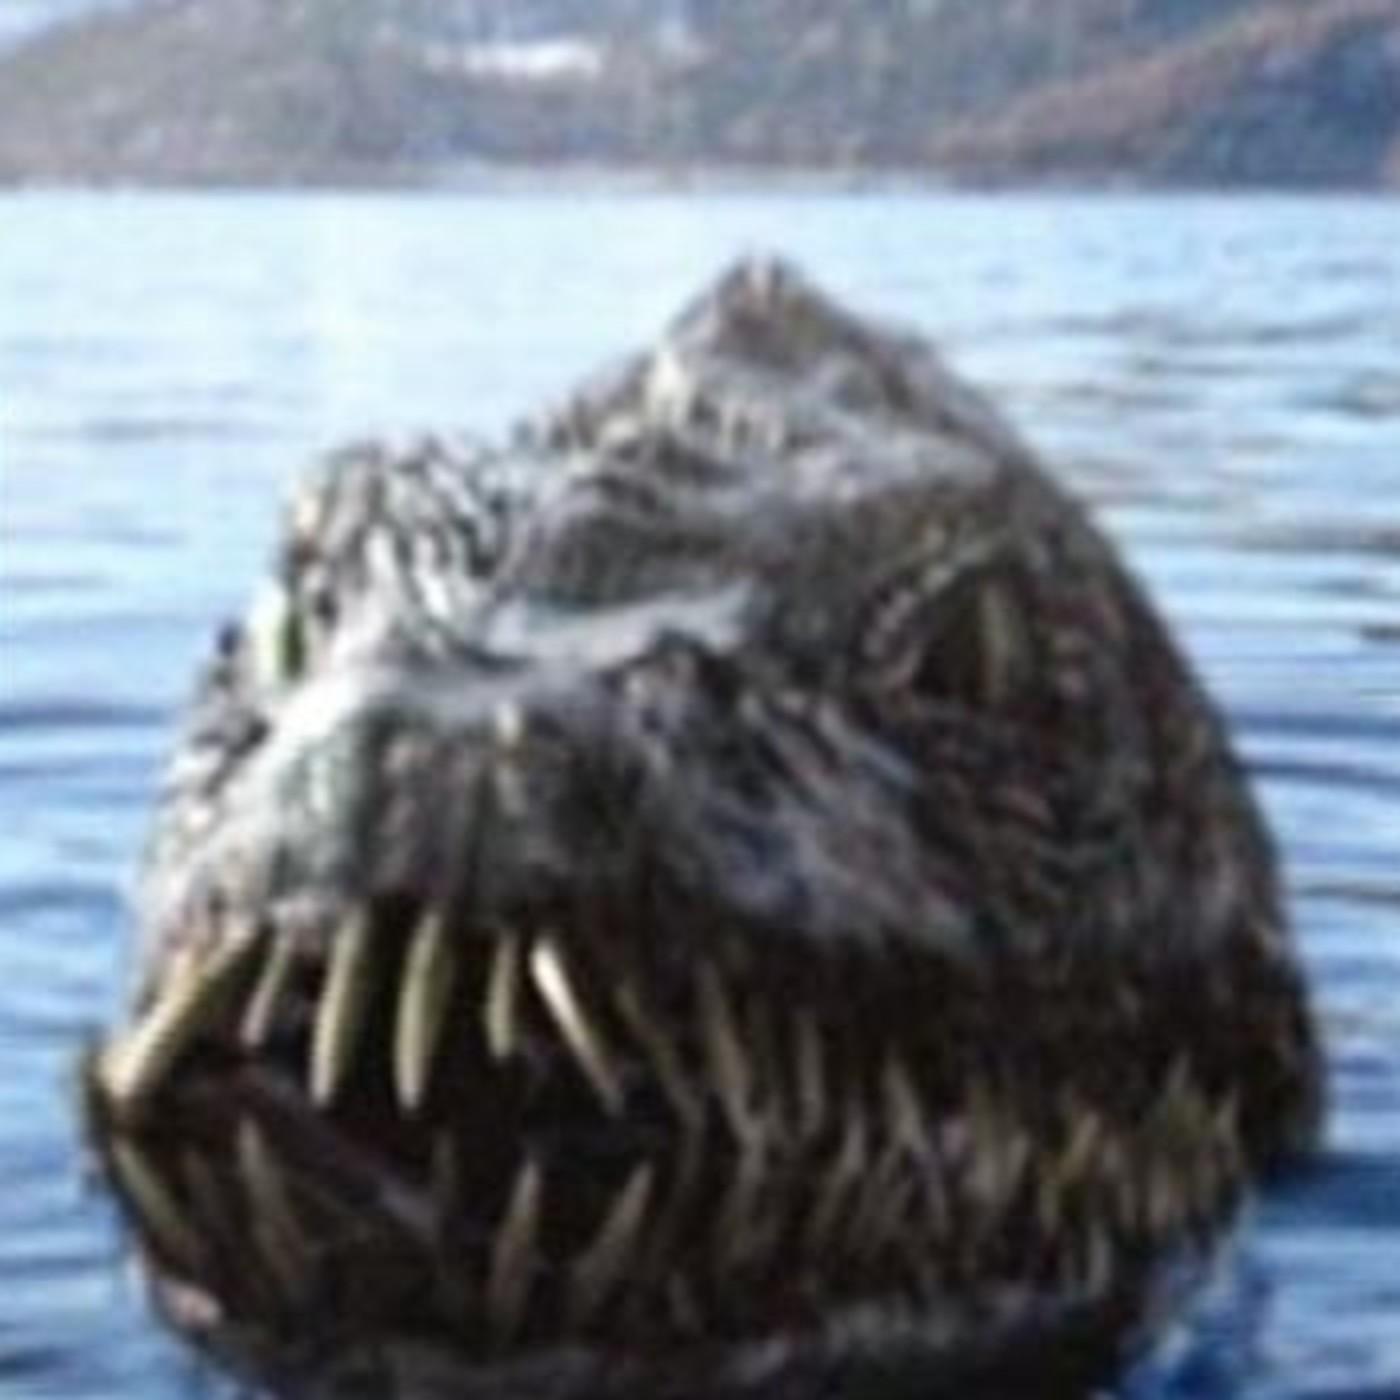 Tak Tak Duken - 281 - Criaturas de Leyenda: El monstruo del Lago Ness